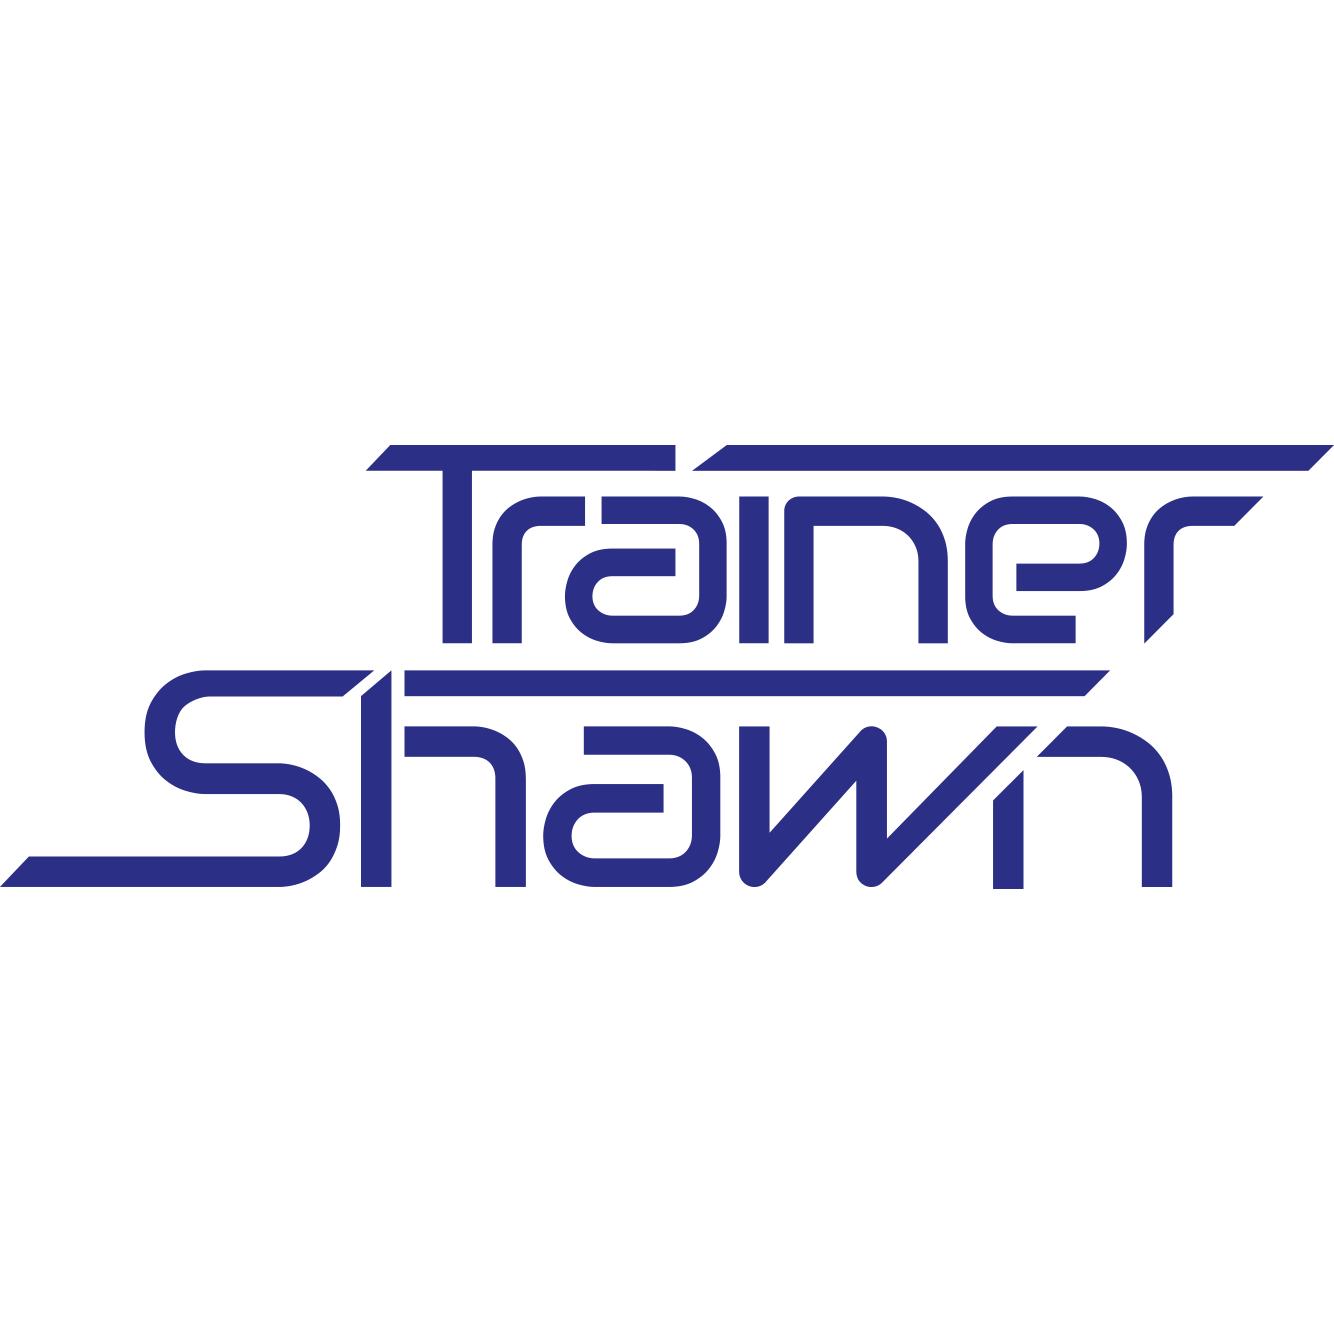 Trainer Shawn